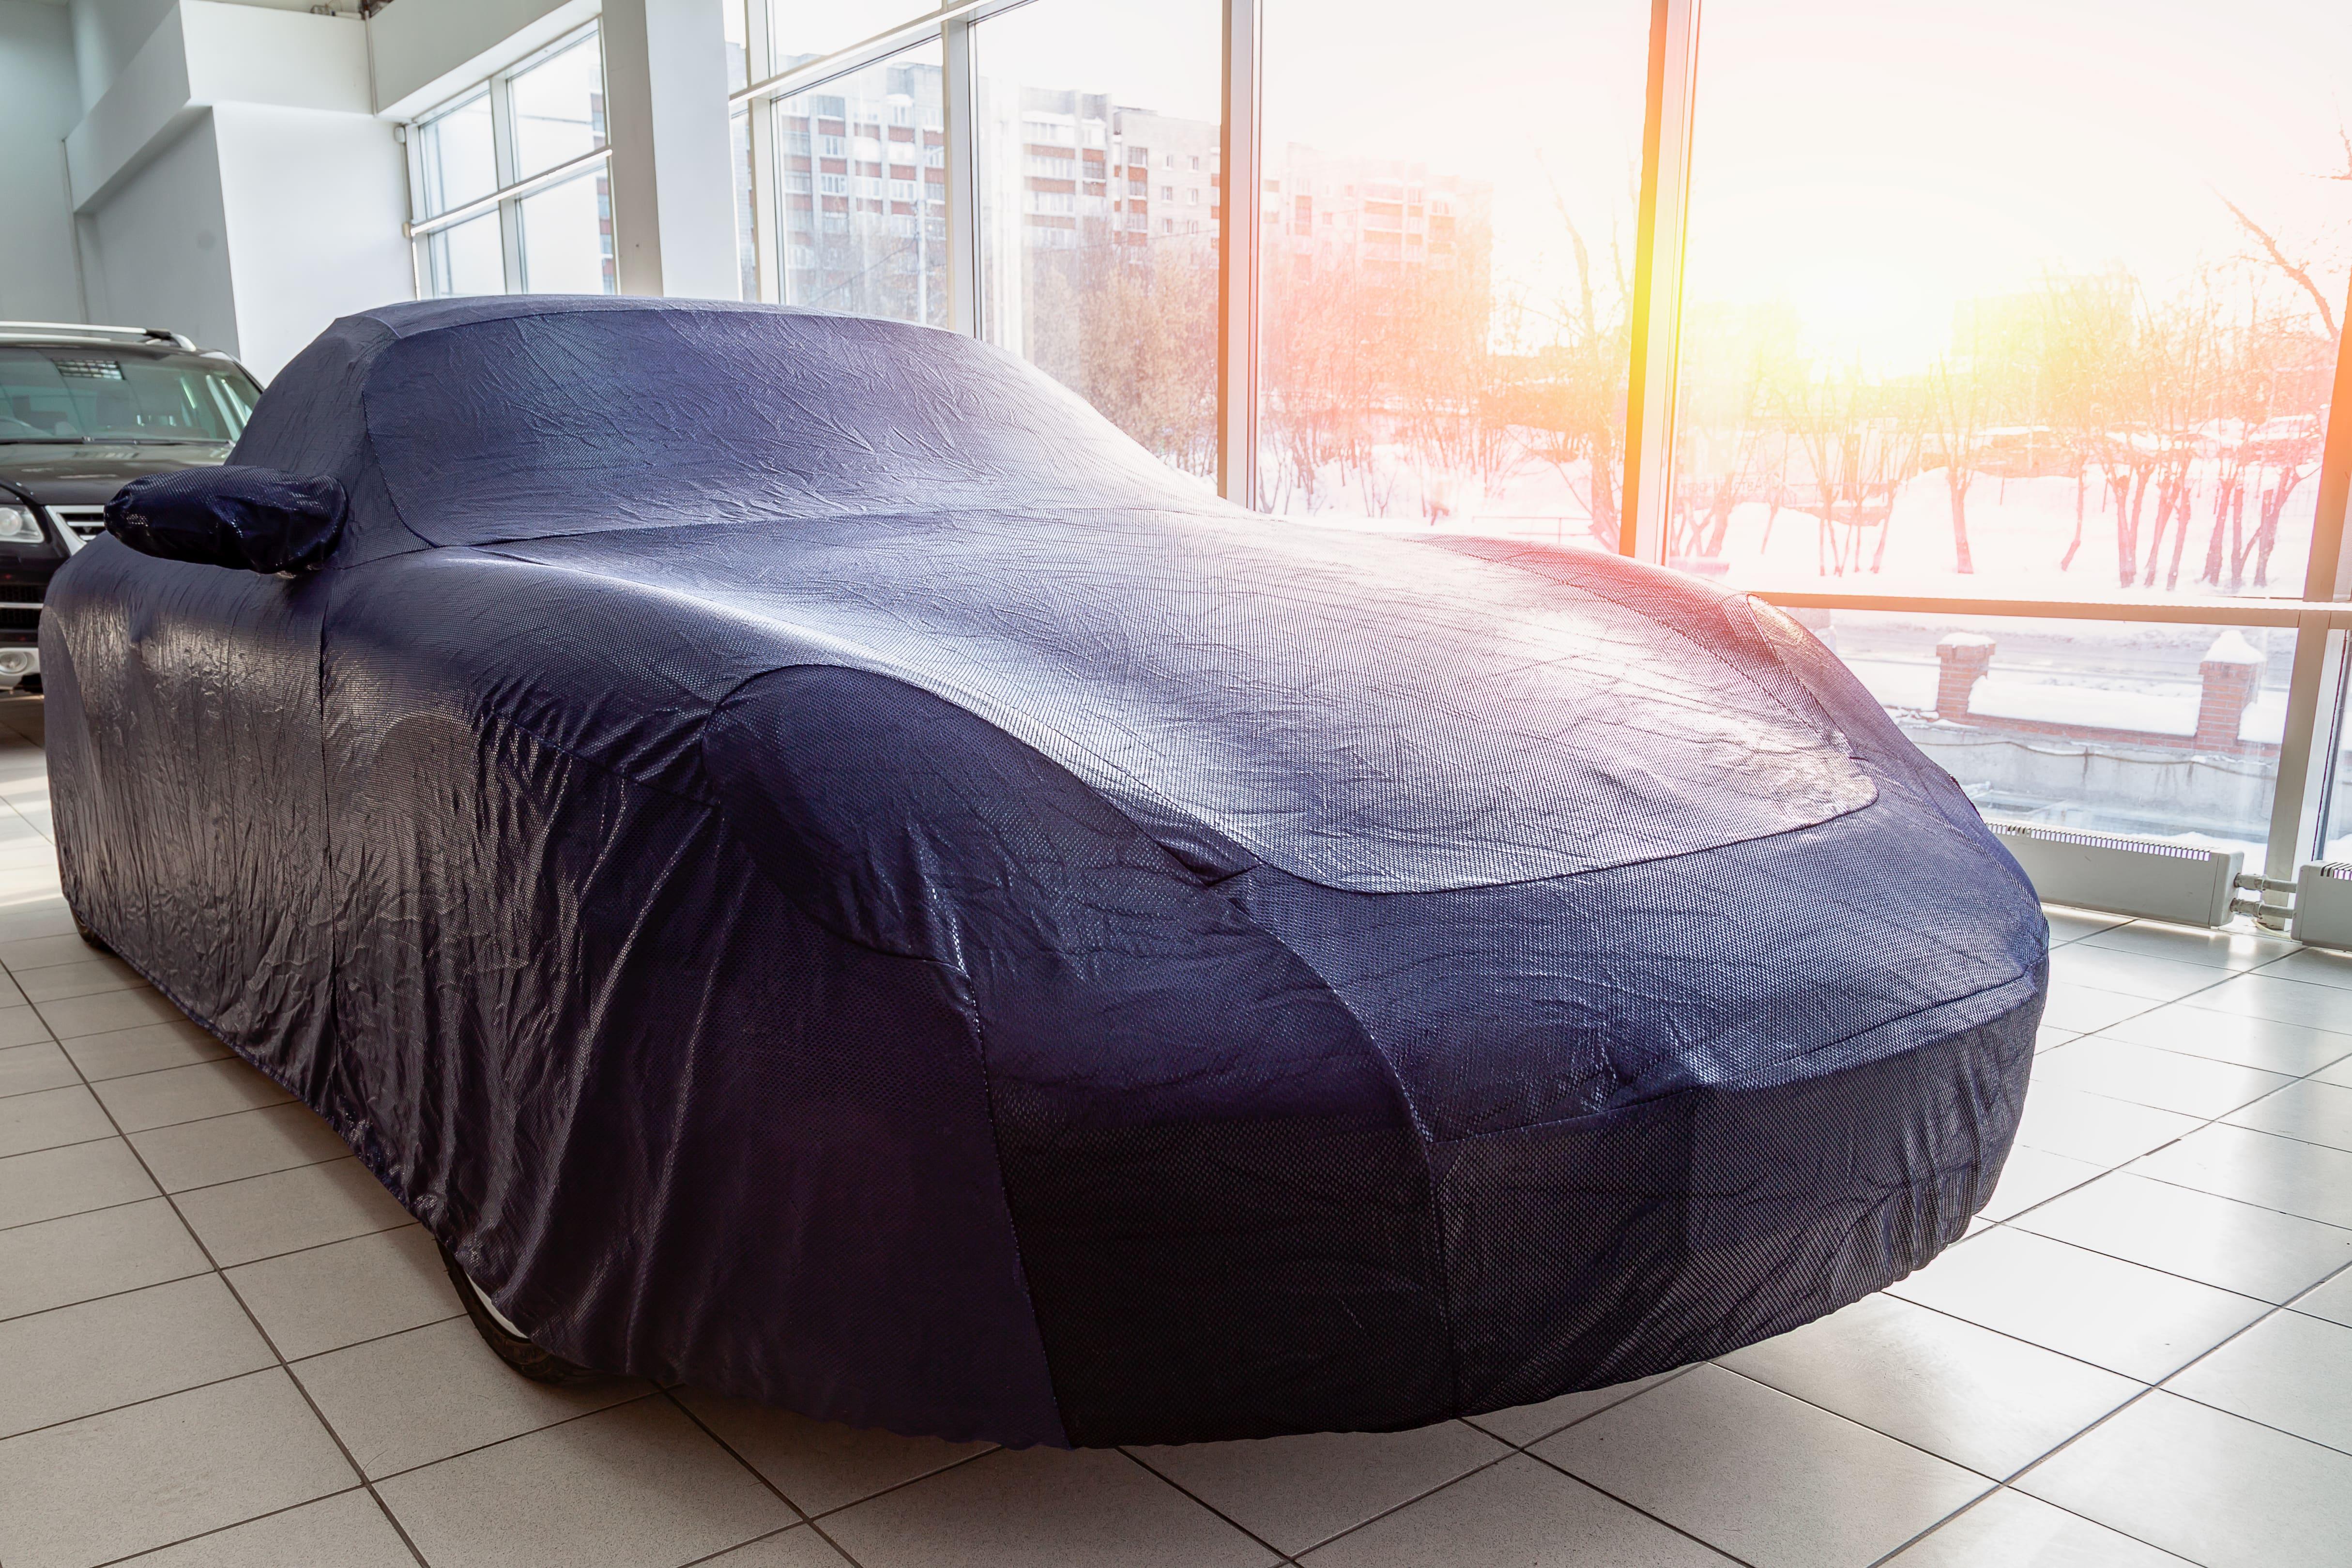 expensive-car-box-carefully-prepared-winter